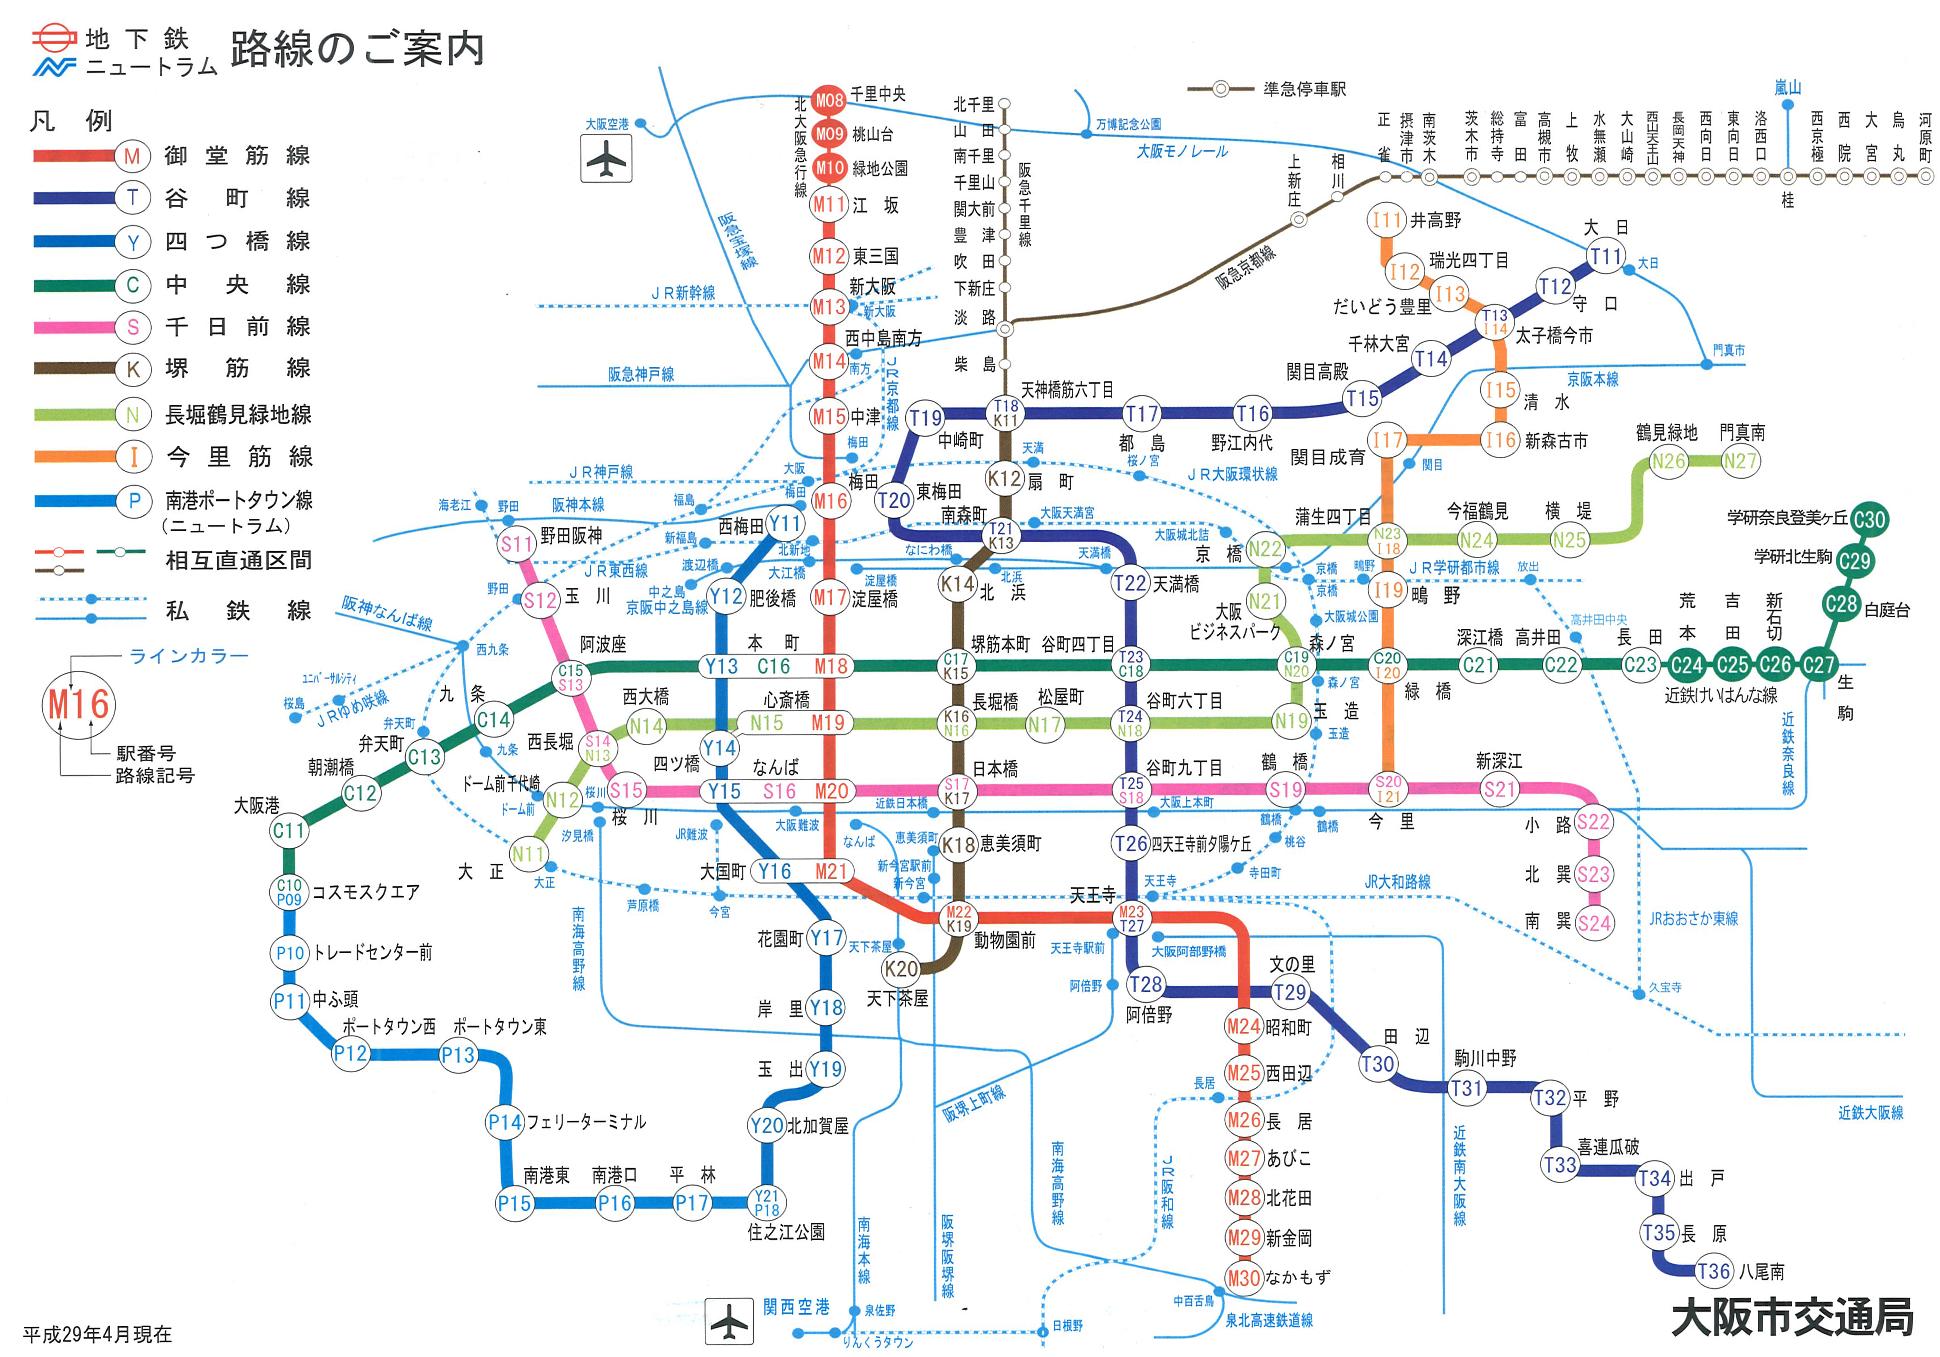 大阪市営地下鉄路線図<沿線マップ>